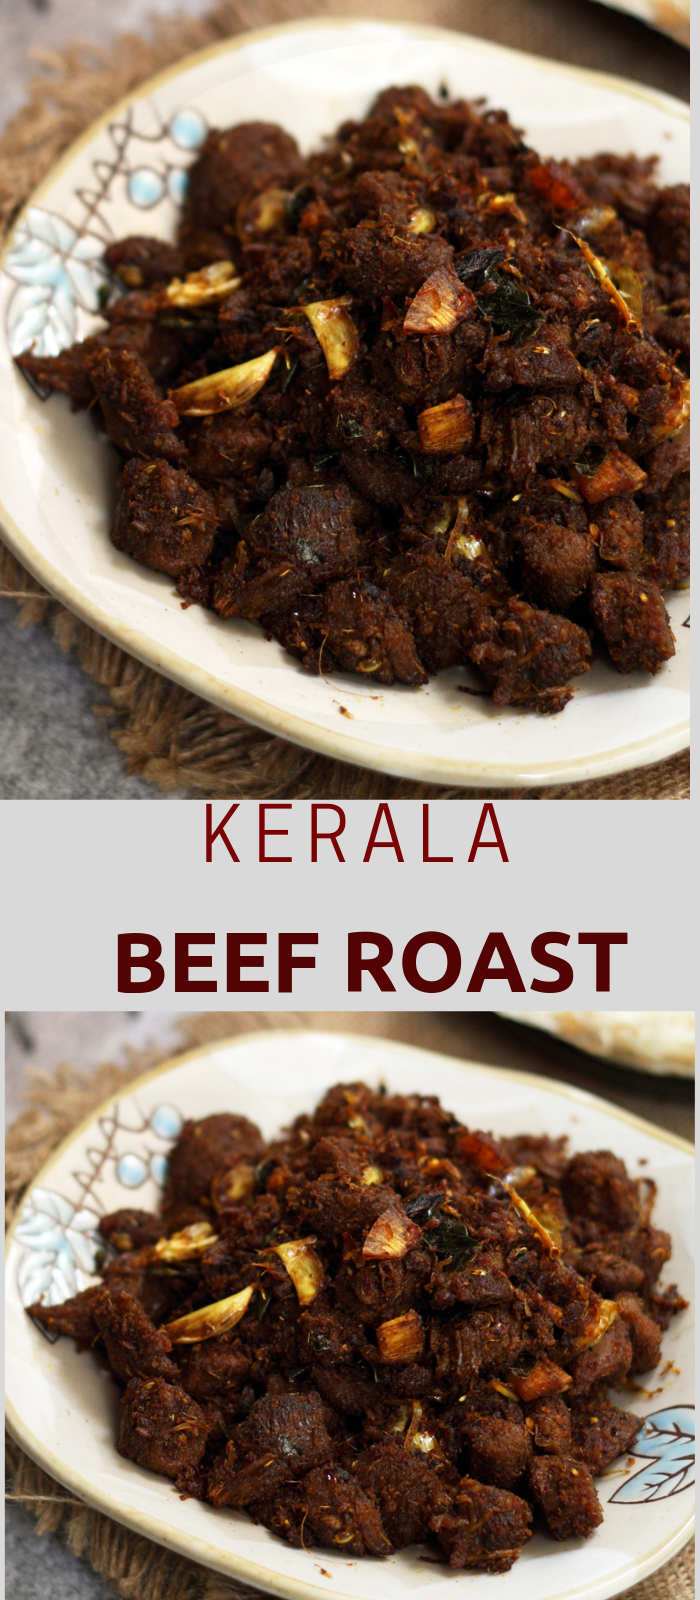 Beef Ularthiyathu Or Kerala Beef Fry Suji S Cooking Recipe Food Beef Dishes Beef Recipes